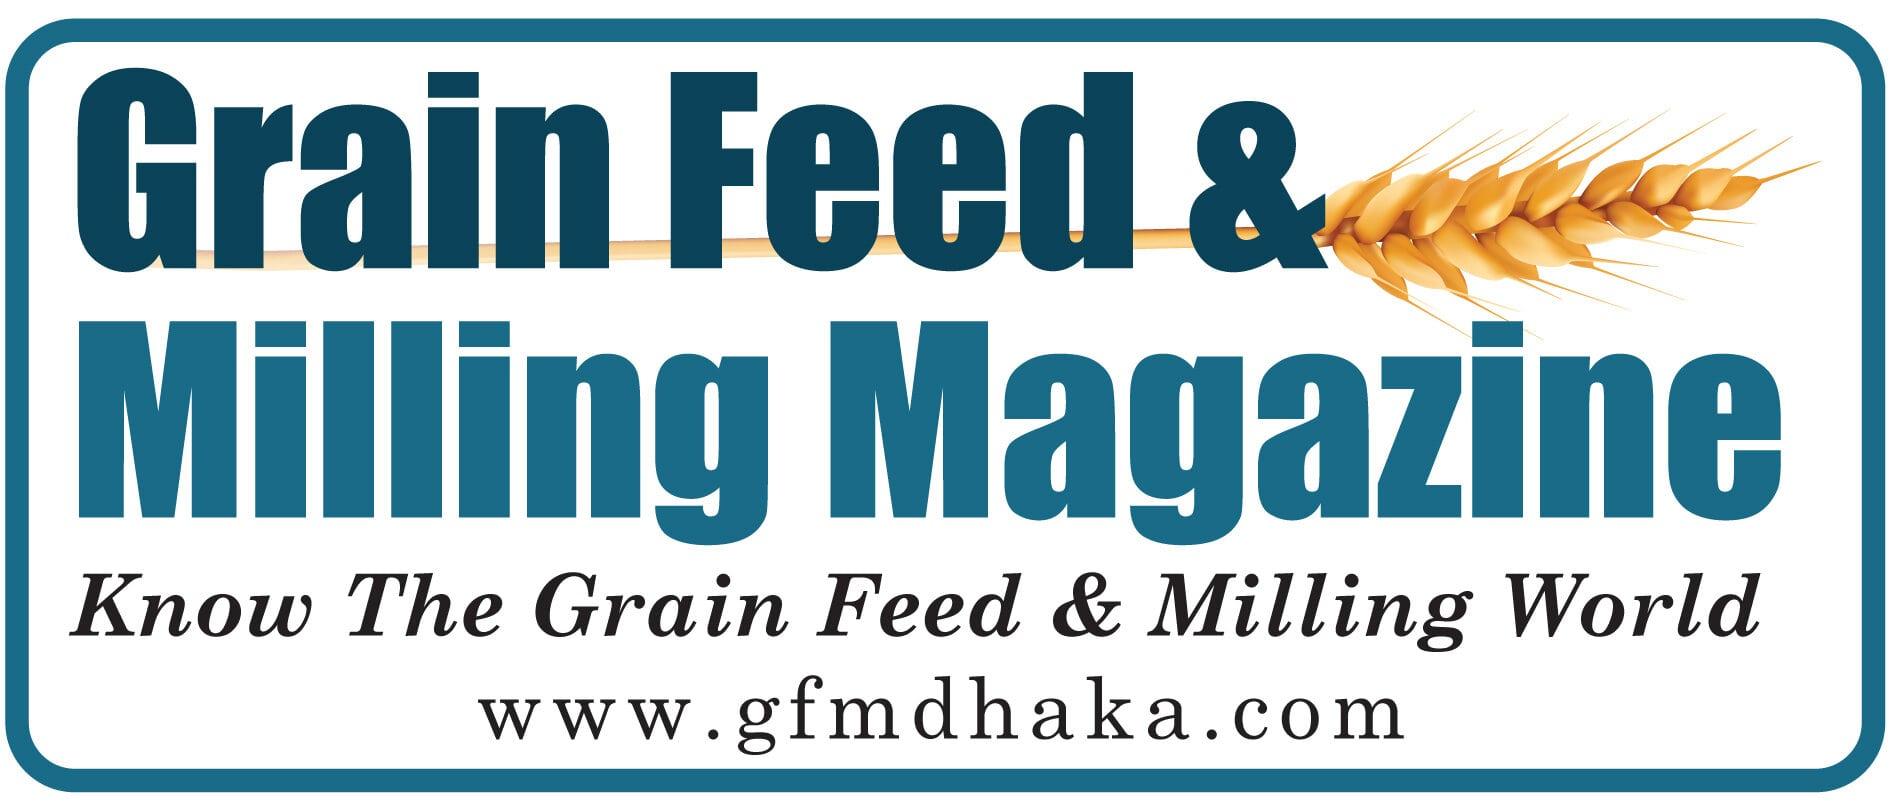 Grain Feed Milling Magazine Logo (1)